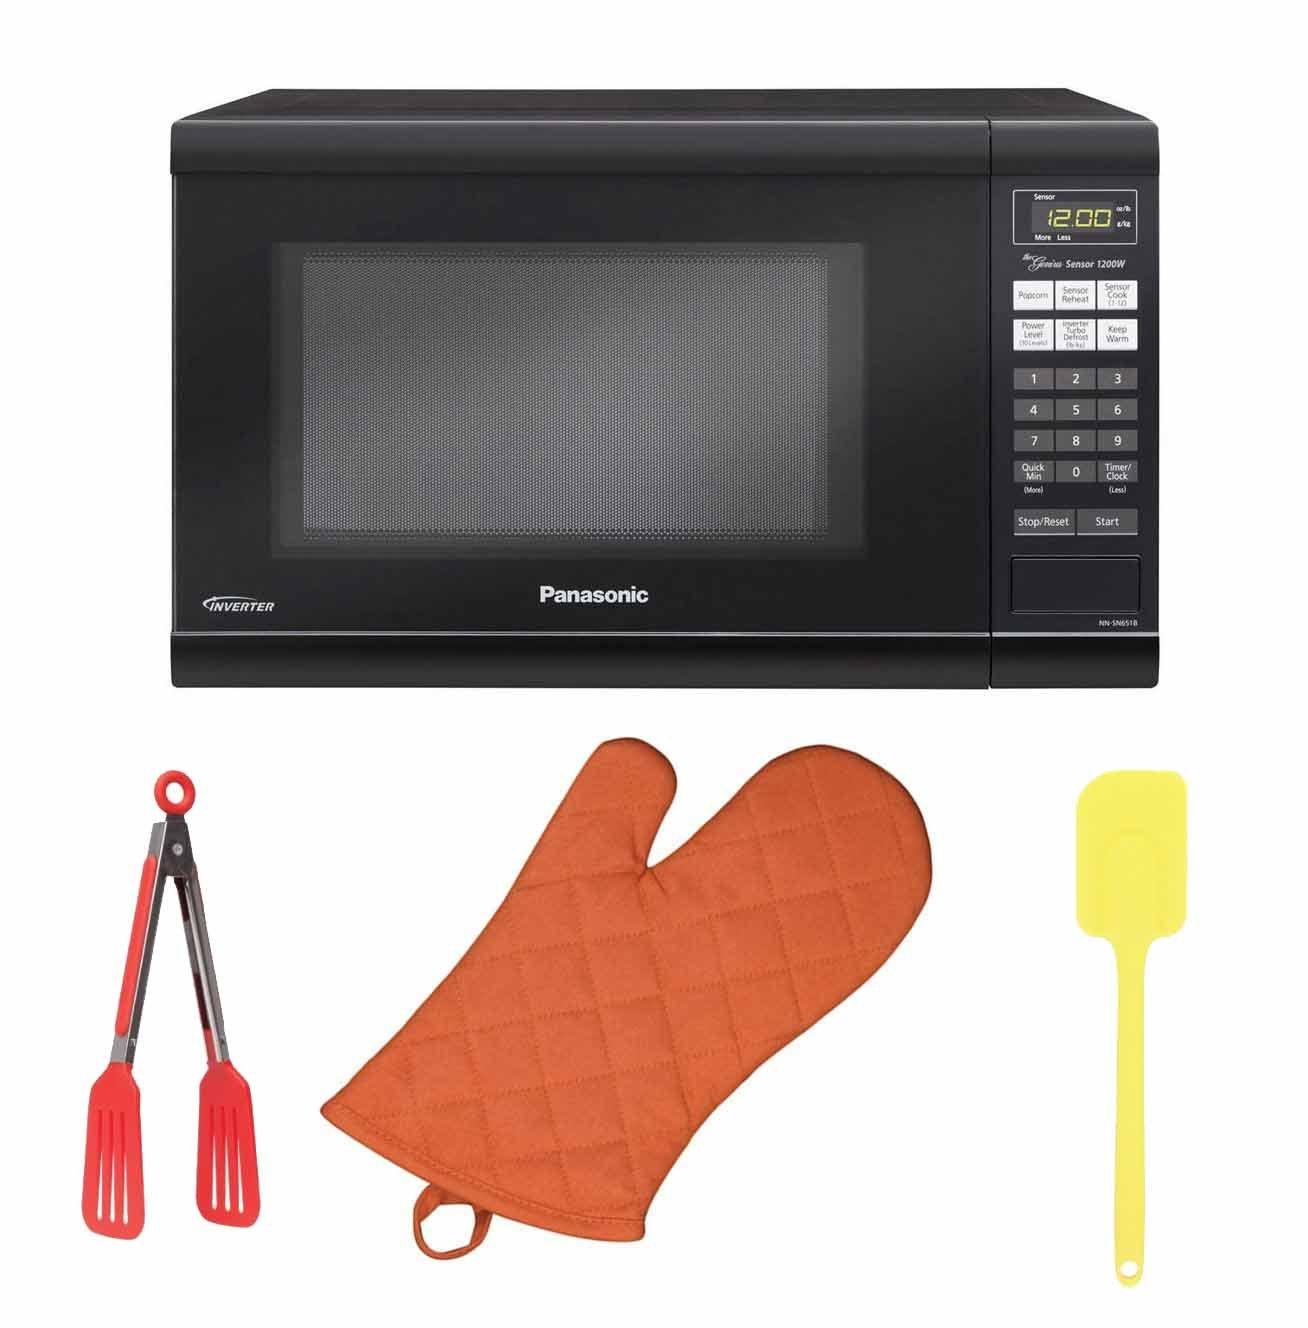 Panasonic NN-SN736B Black 1.6 Cu Countertop Microwave Oven with Inverter Ft